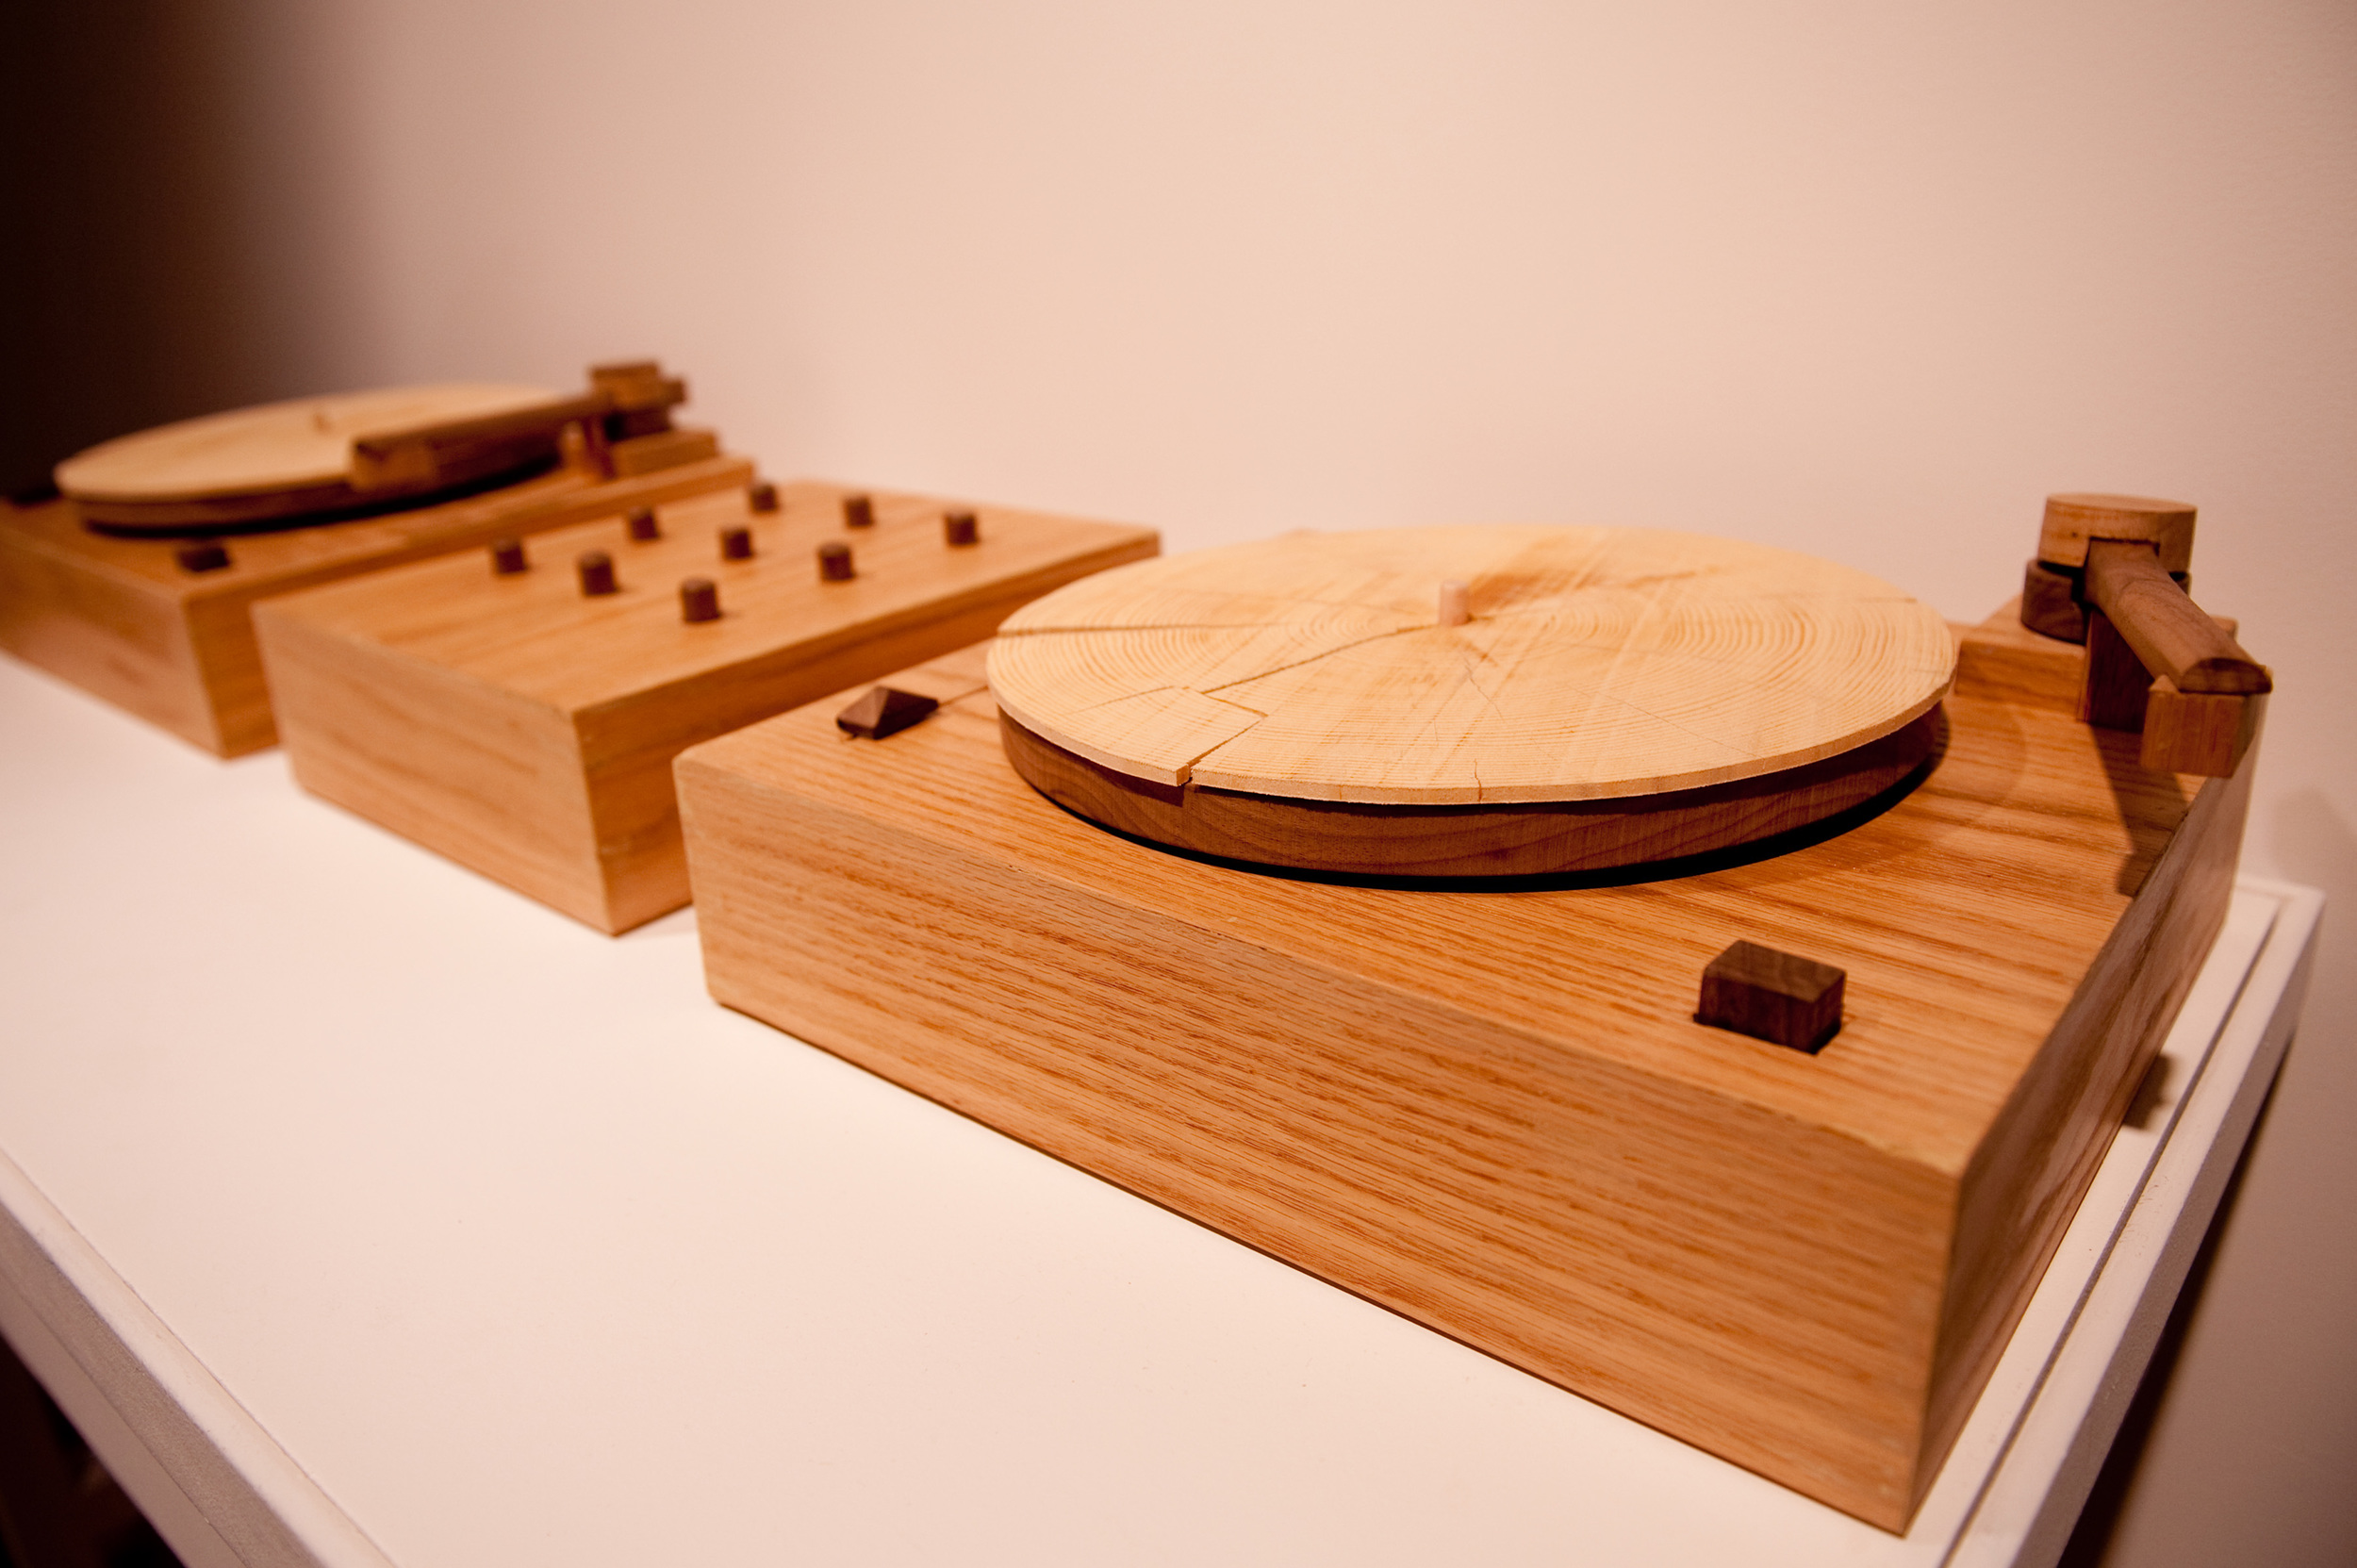 Turning Tables-interactive sculptural sound work 2010-Jordan Bennett.jpg